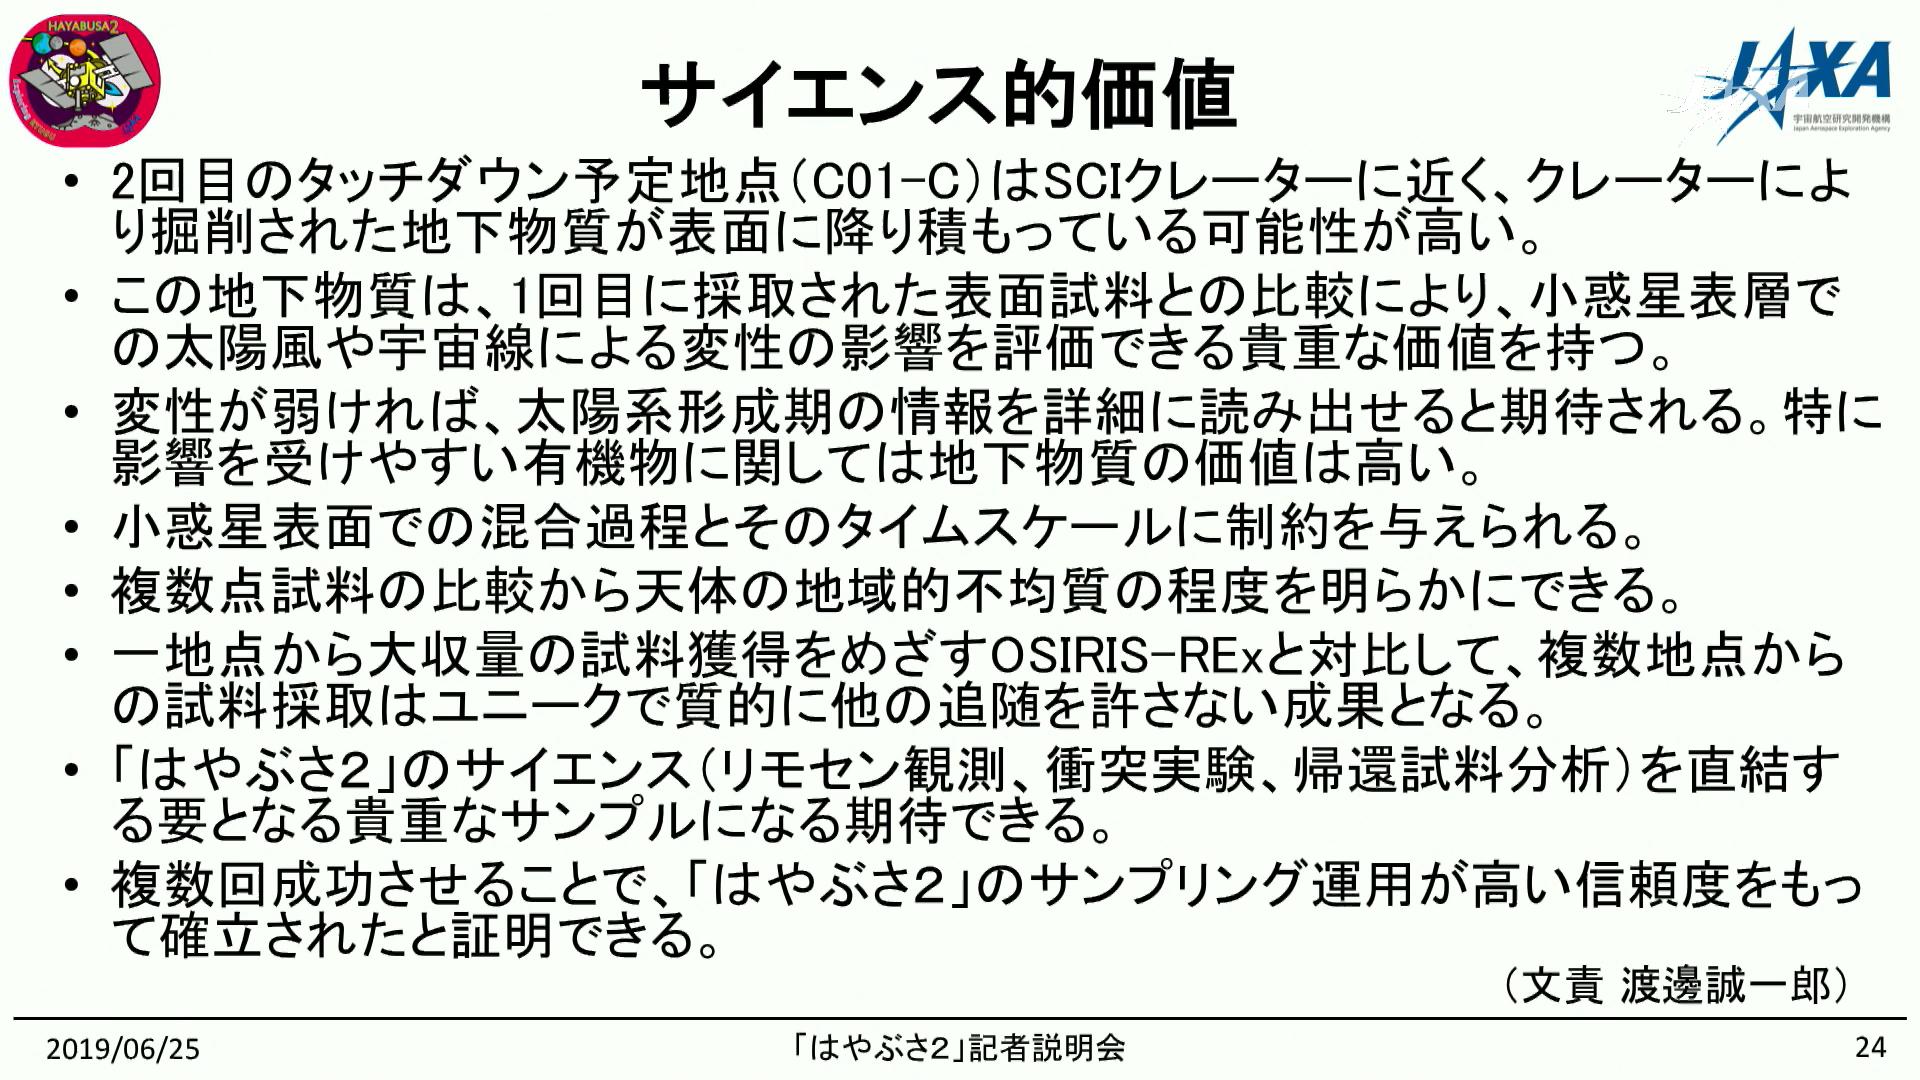 f:id:Imamura:20190625234909p:plain